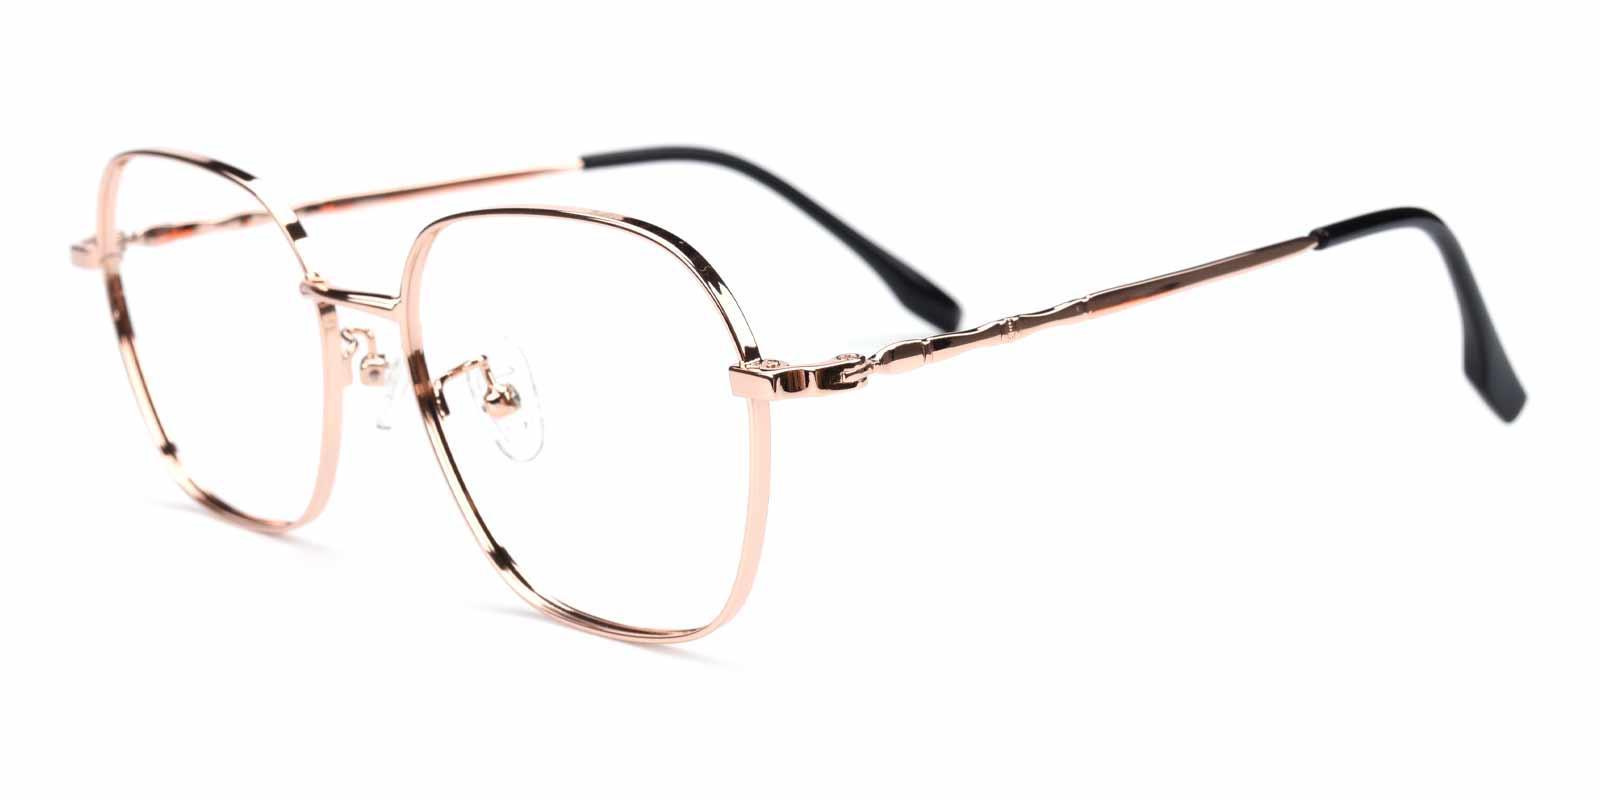 Aidan-Gold-Square-Metal-Eyeglasses-additional1